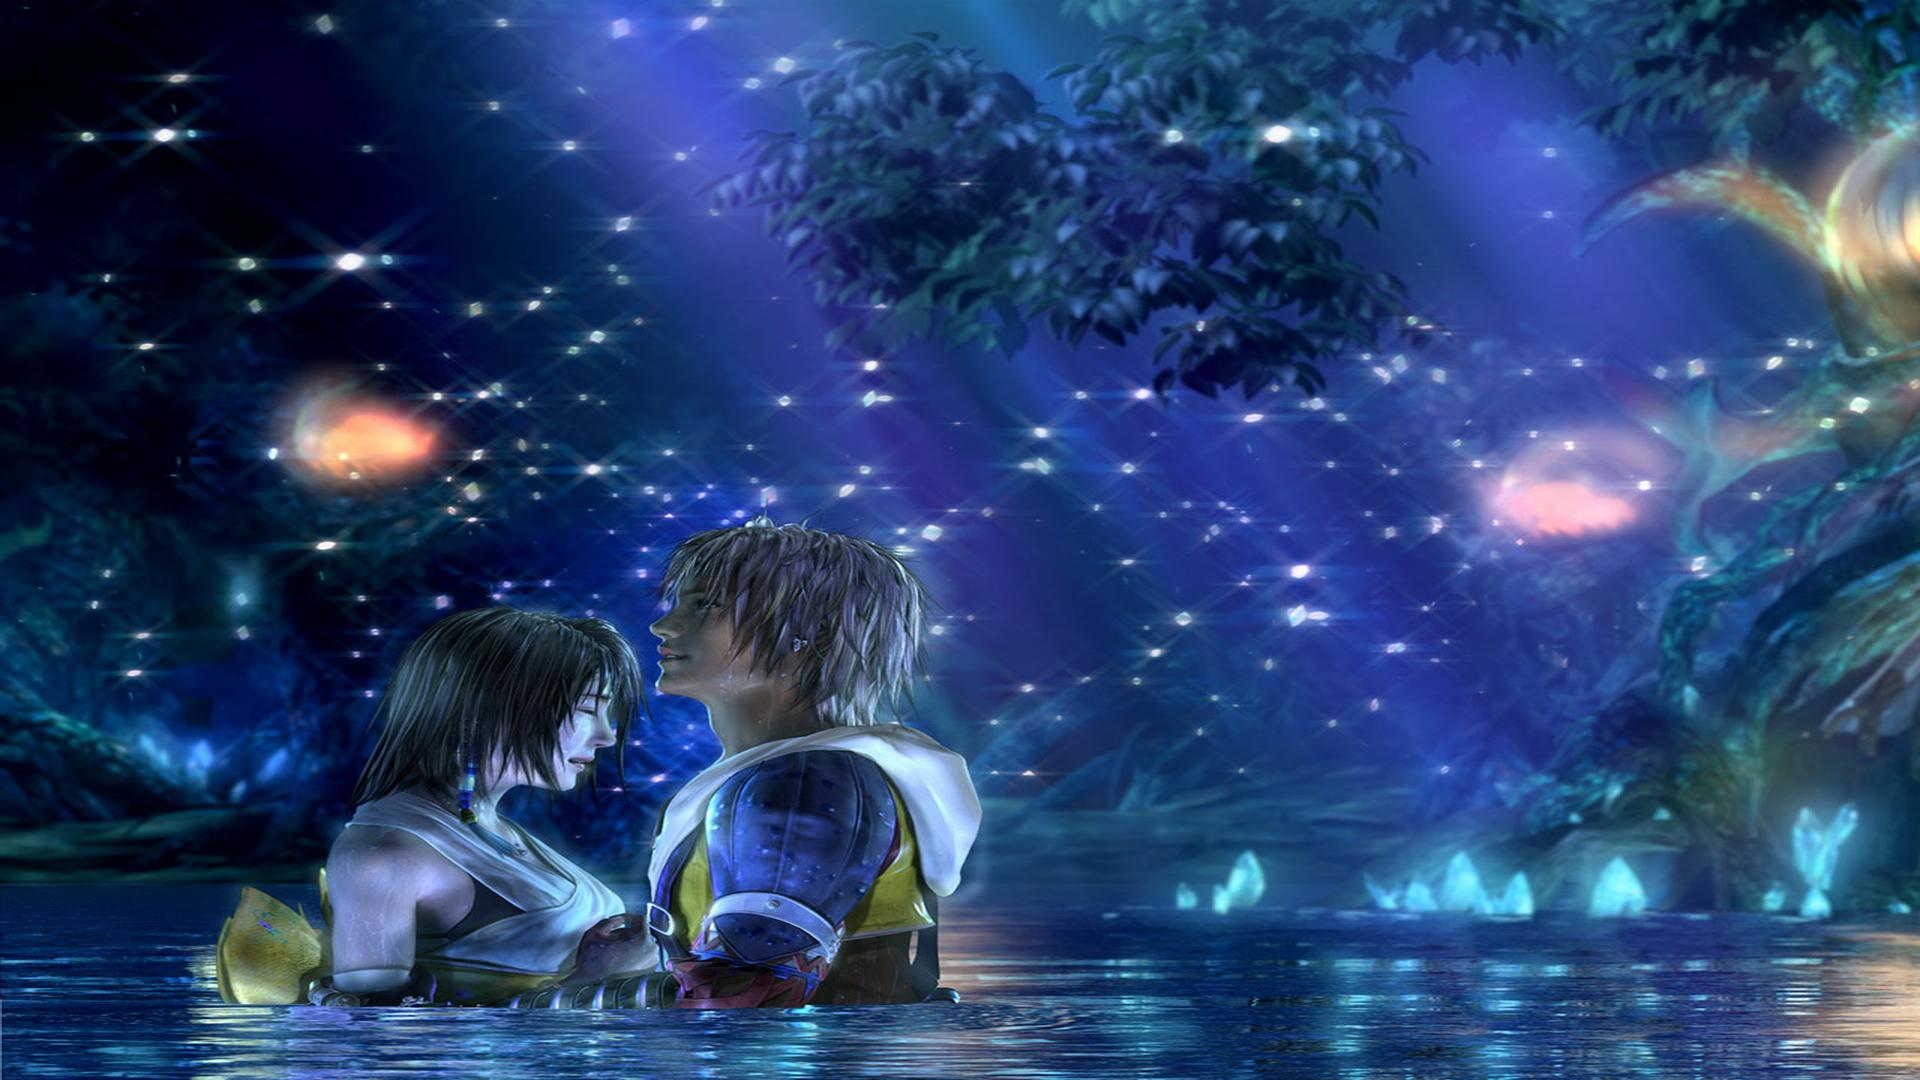 Final Fantasy X Wallpapers Hd 77 Images: Final Fantasy 10 HD Wallpaper